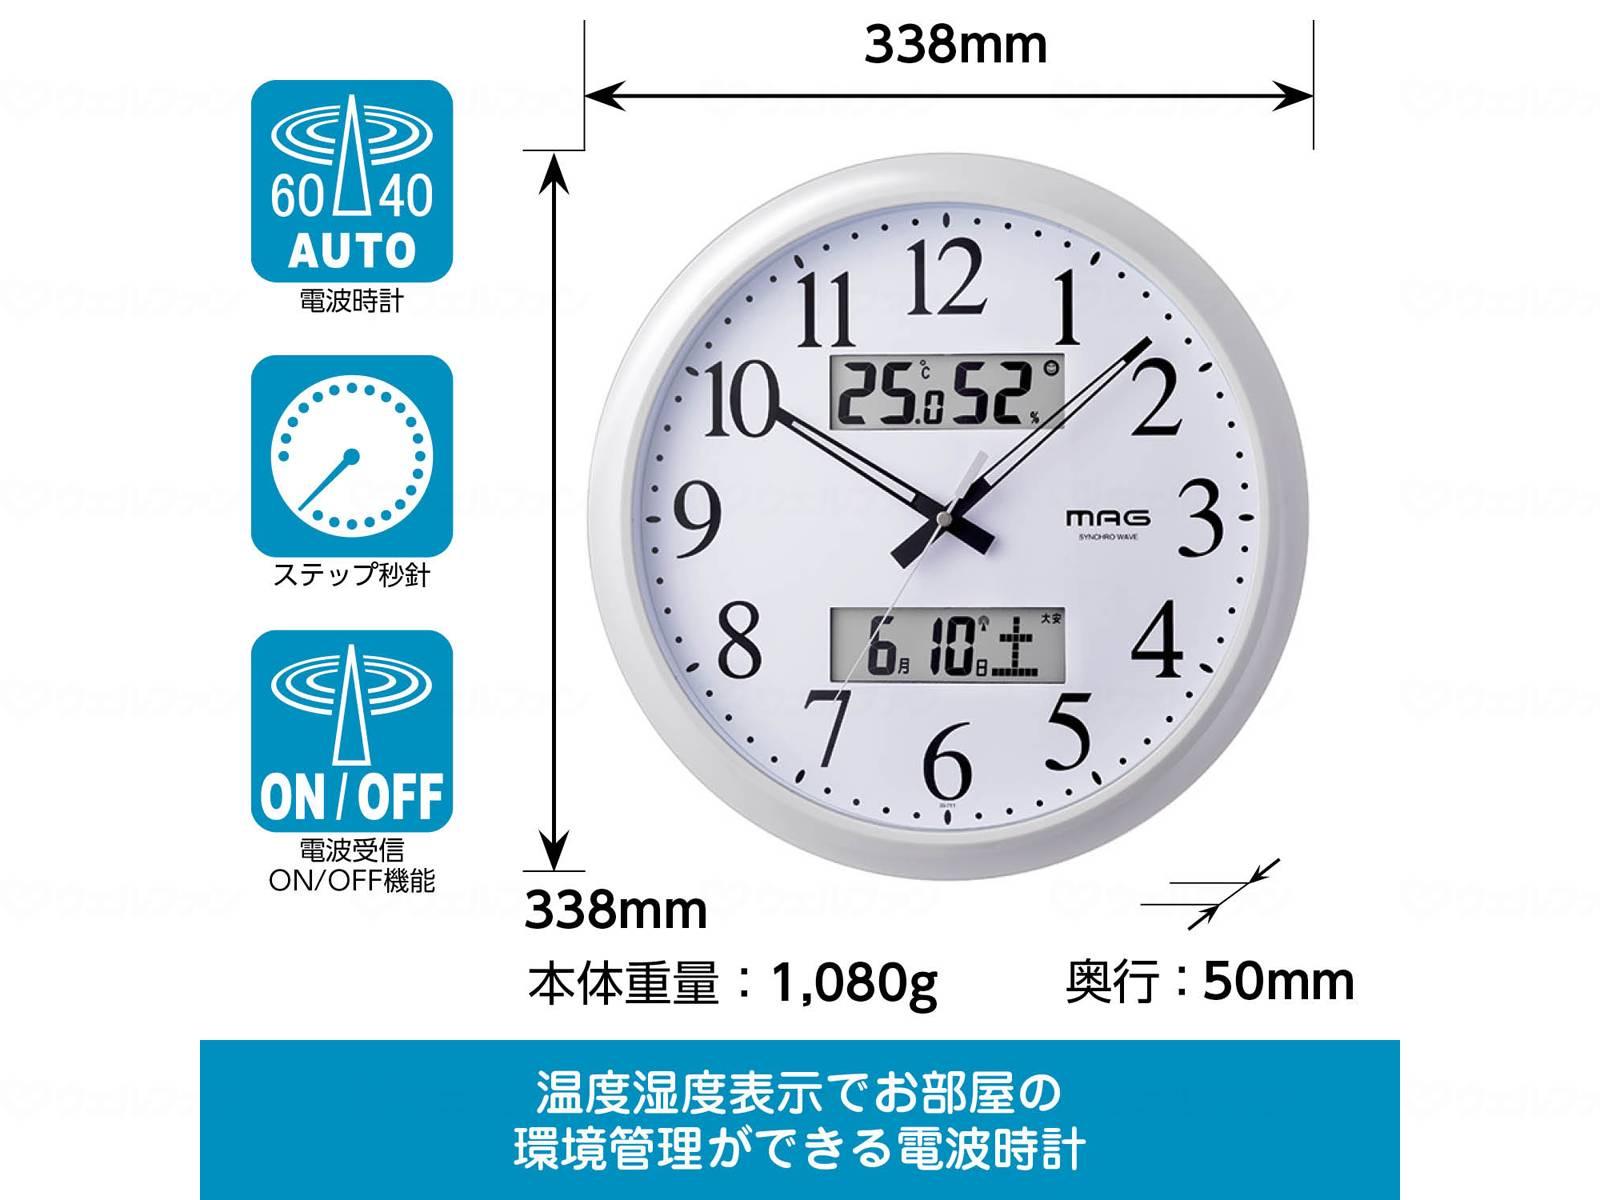 MAGダブルリンク電波掛時計の画像